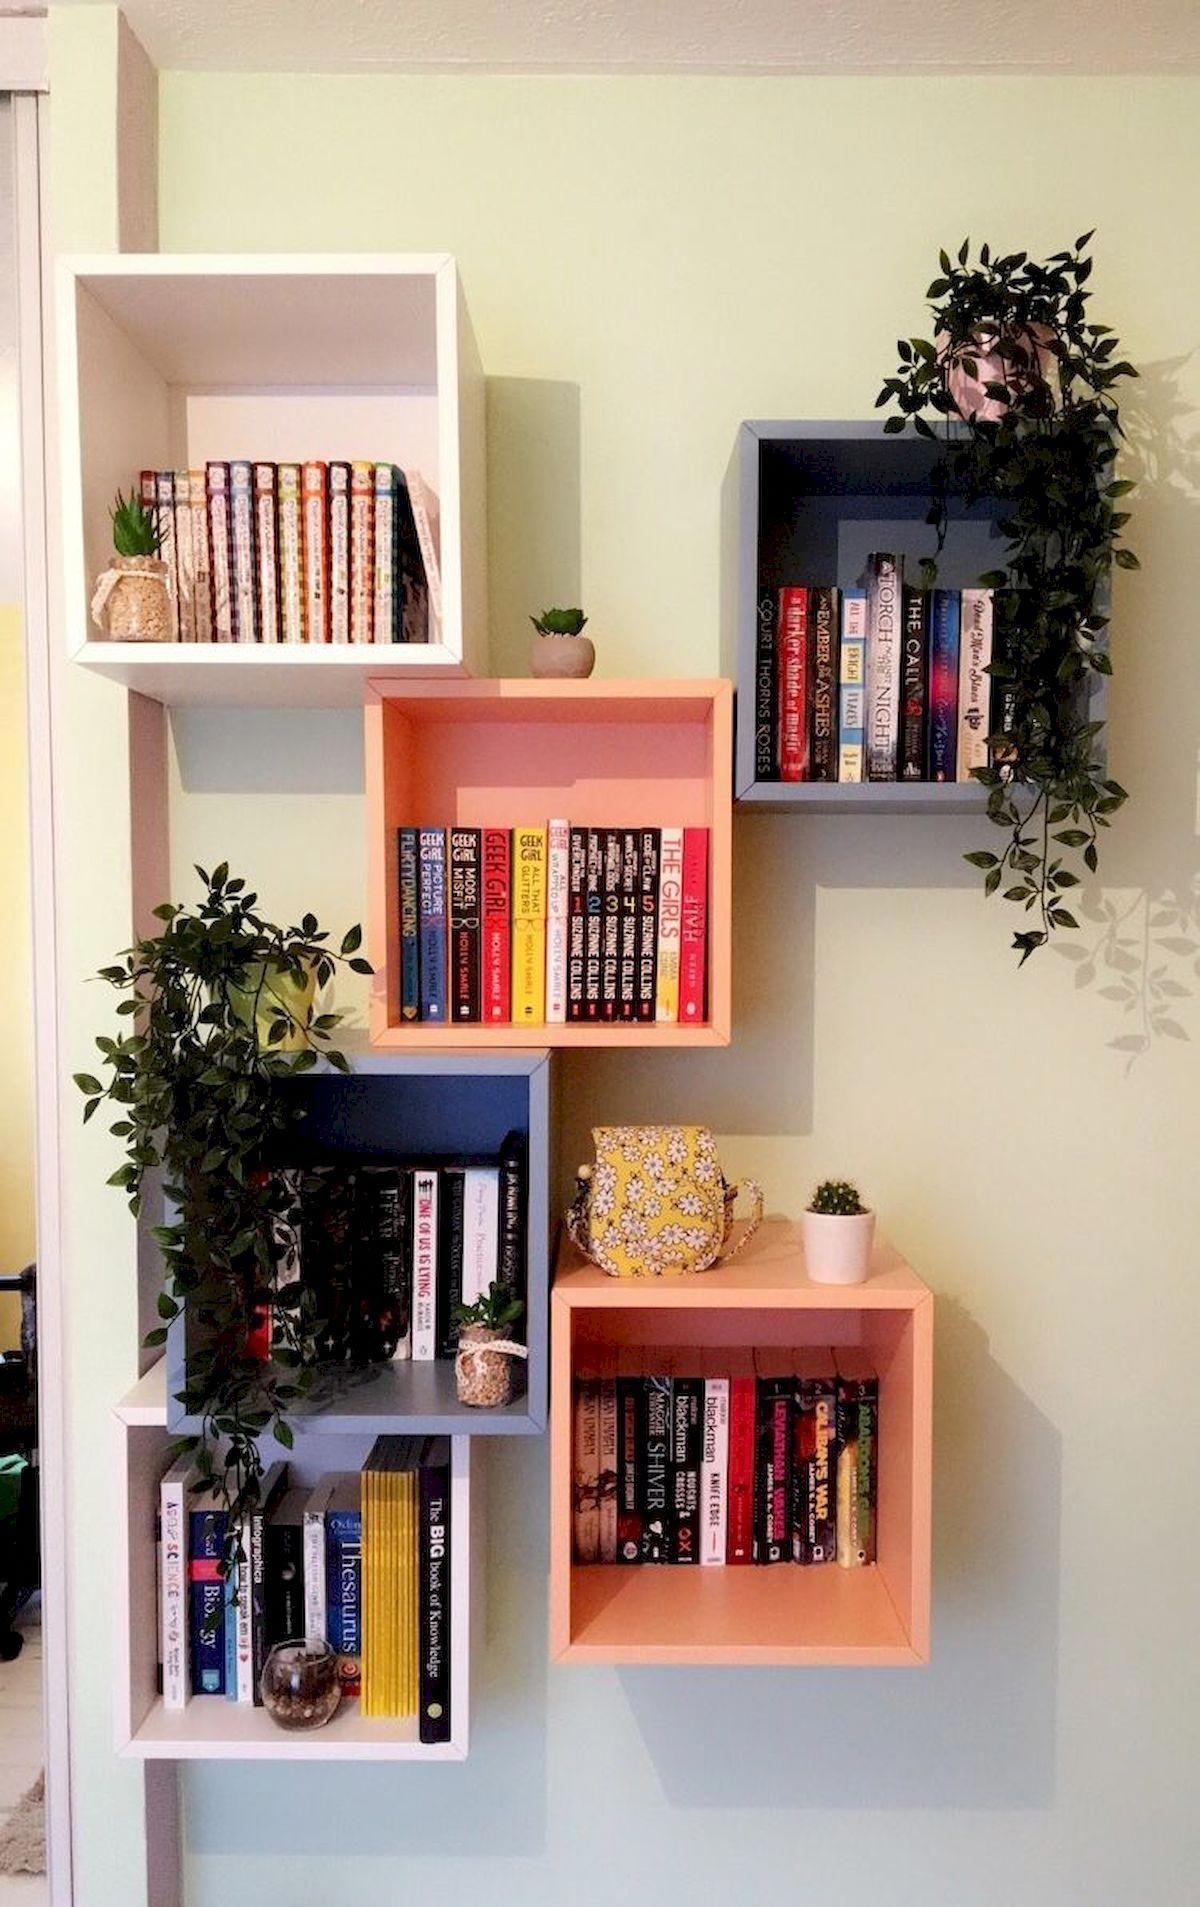 Ikeabedroomideas Bookshelves In Bedroom Shelf Decor Bedroom Bookshelves Diy